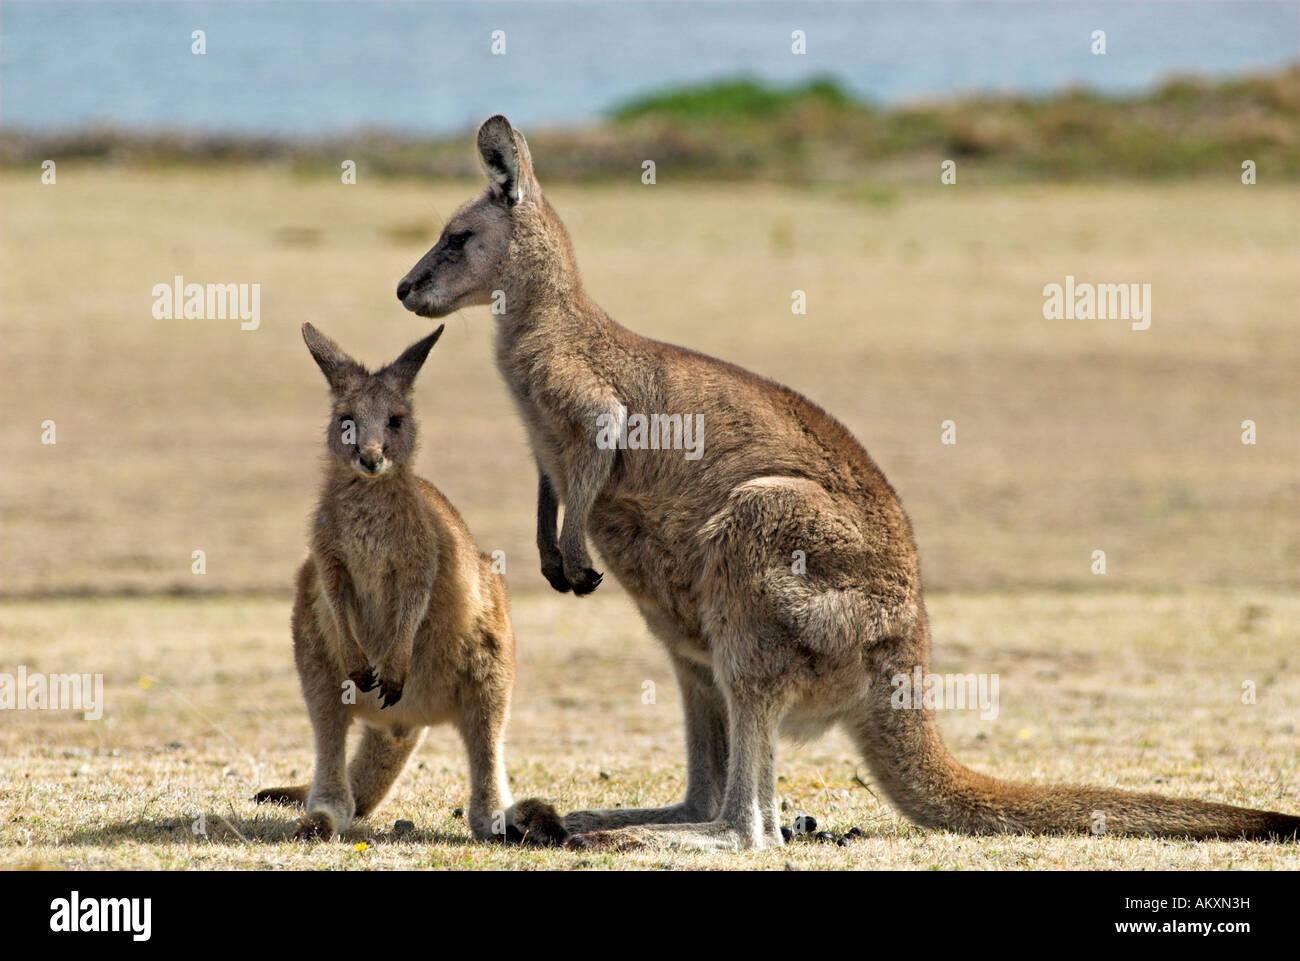 Känguruh Stockfotos & Känguruh Bilder - Alamy